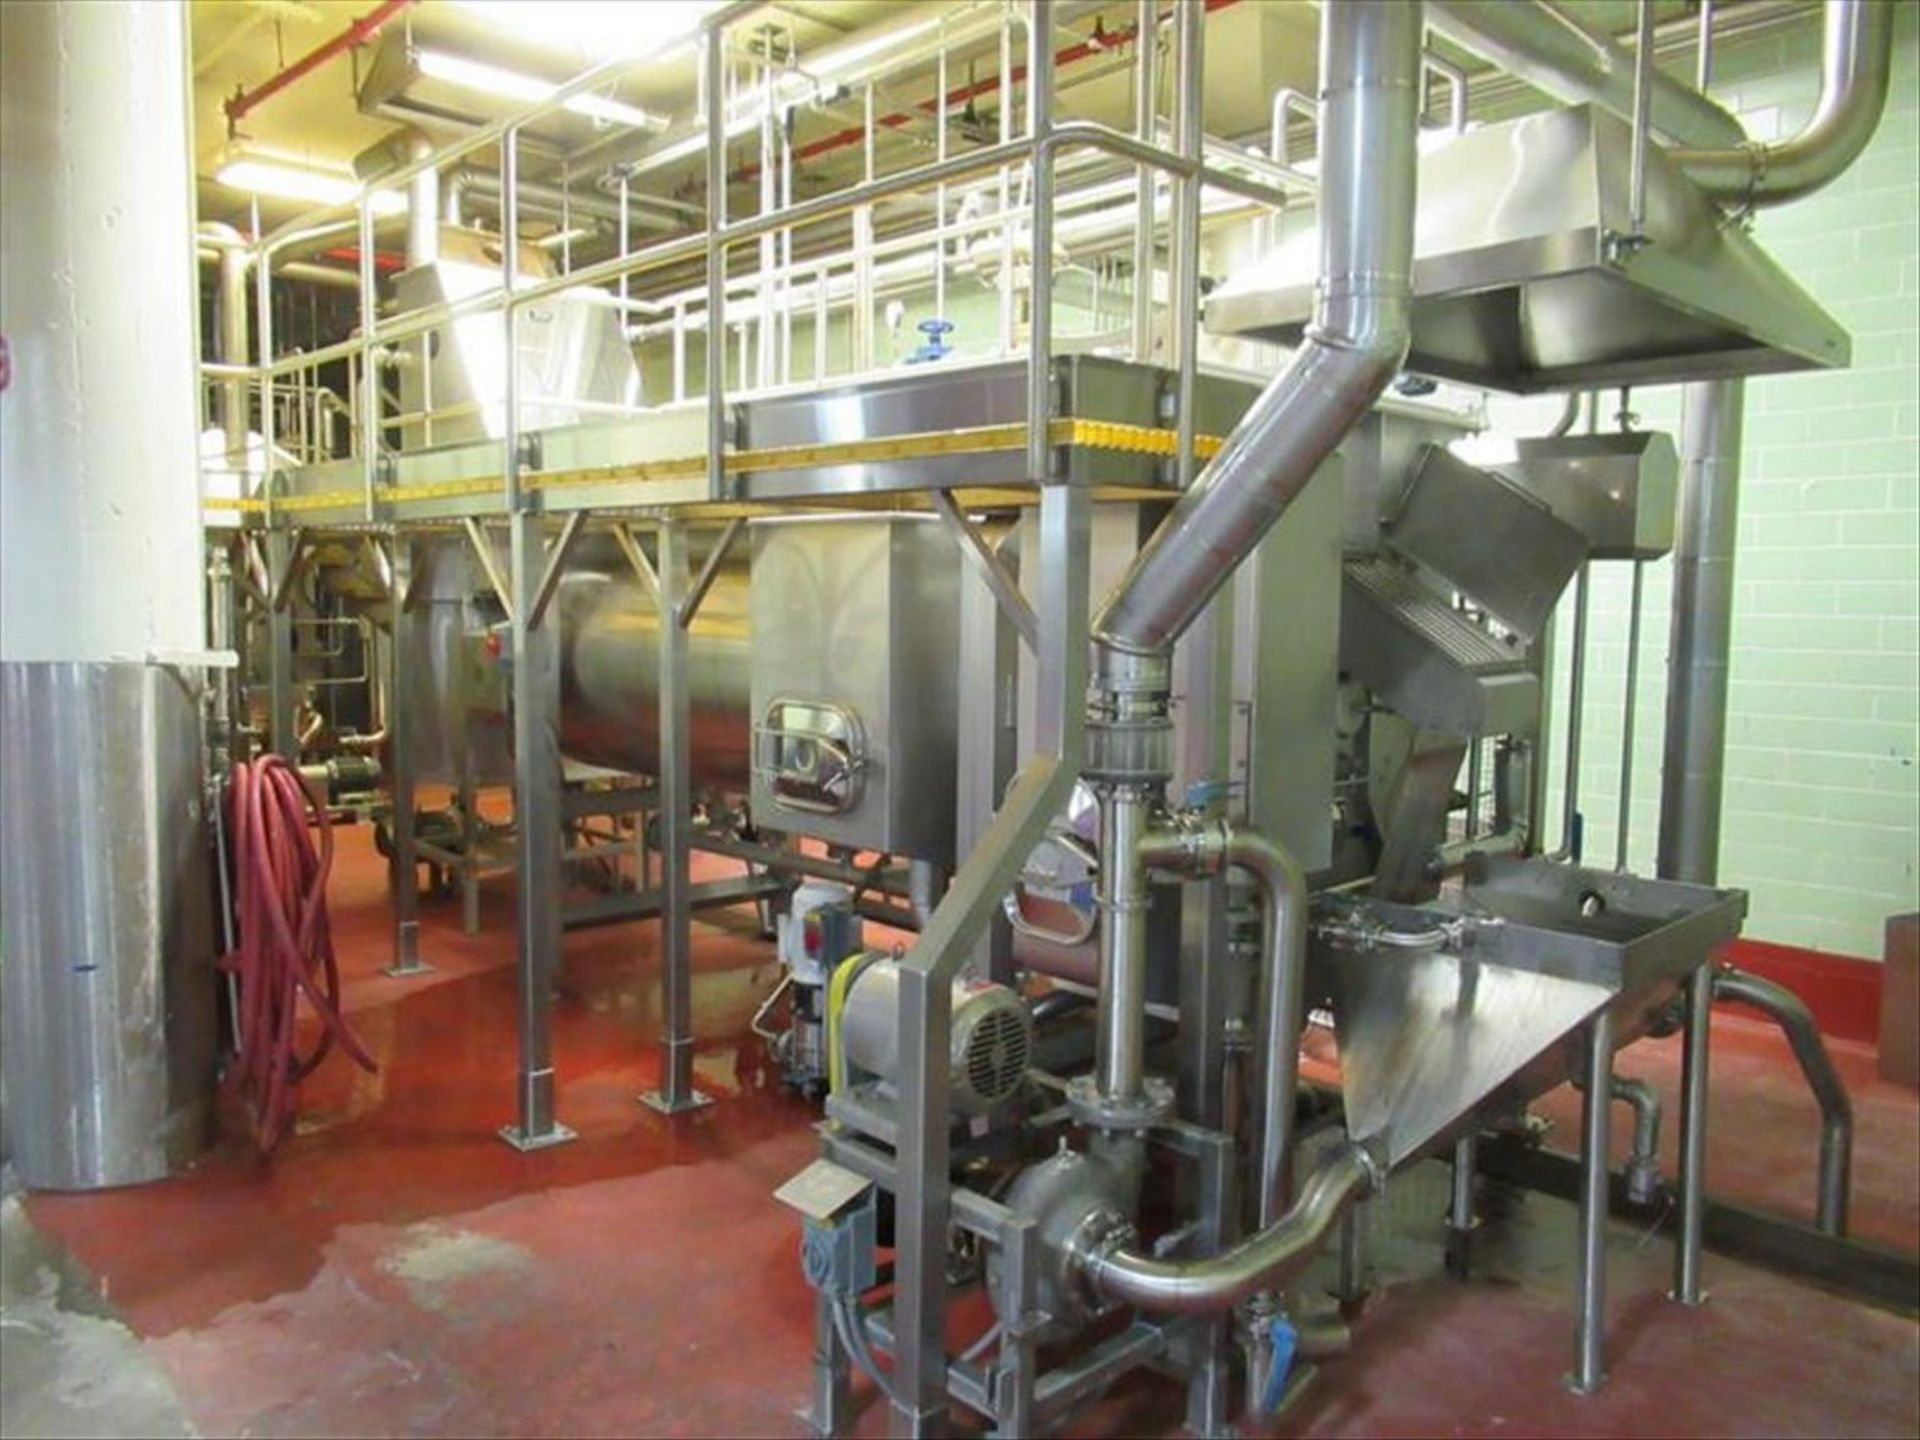 Lot 217 - Dutch Tech Source hot water blancher #3 mod. no. 01.000x3.500 approx 55 in dia x 153 in l shell,